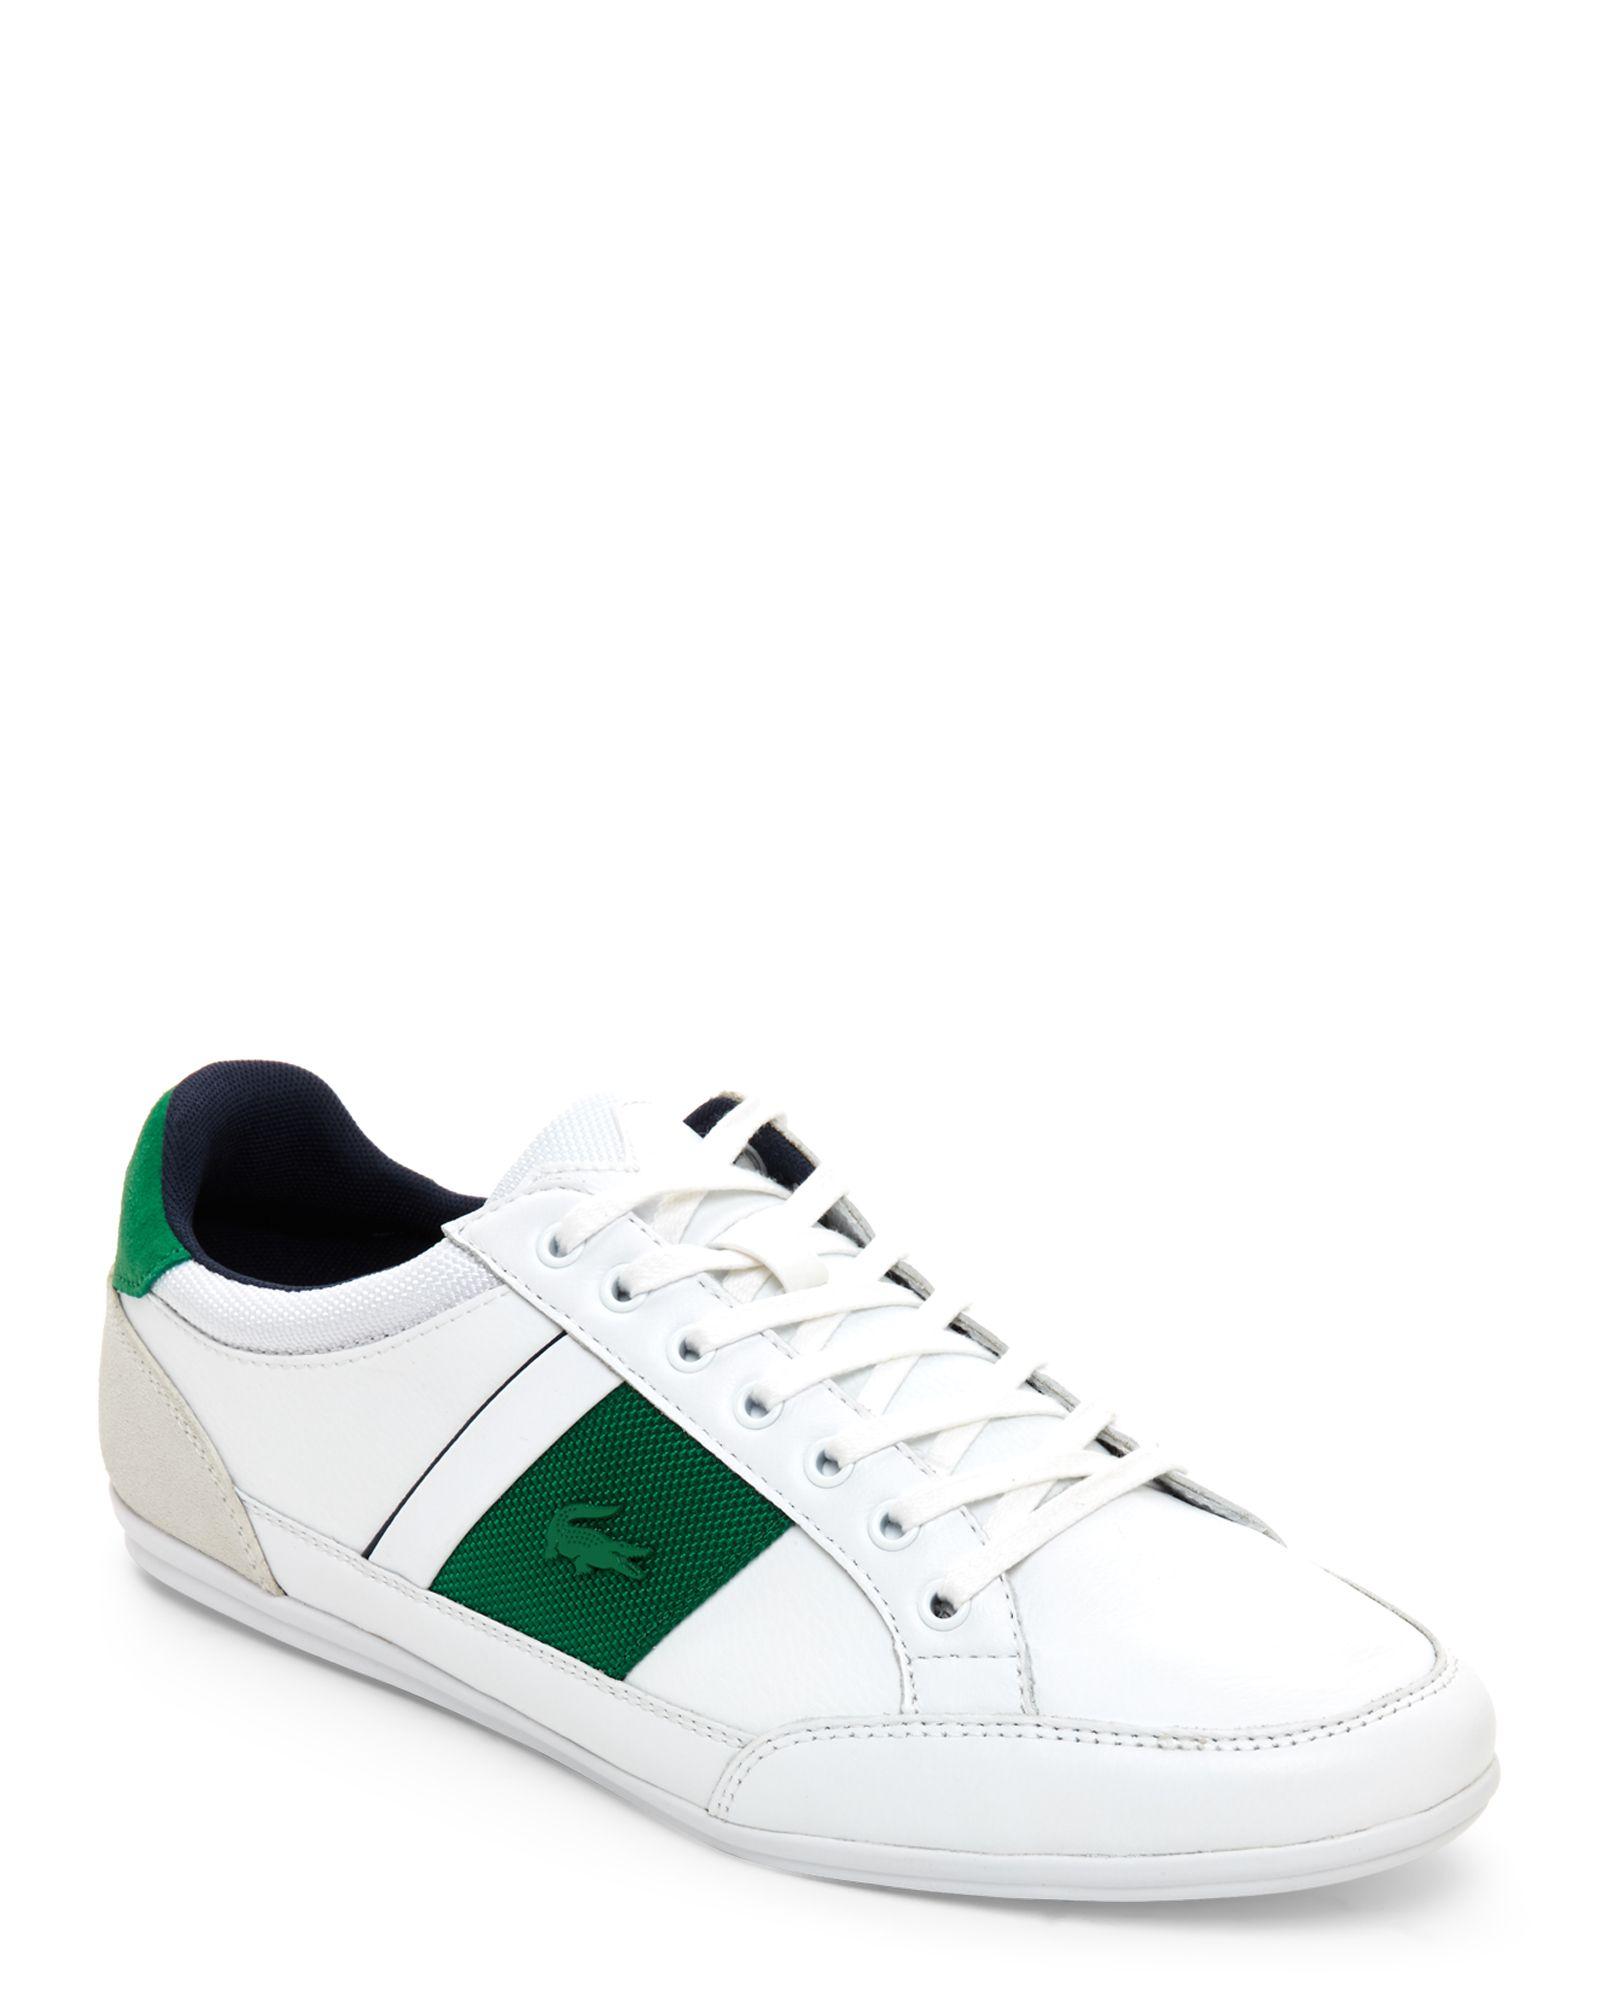 5fa763dd4a2e White   Green Chaymon Leather Low Top Sneakers in 2019